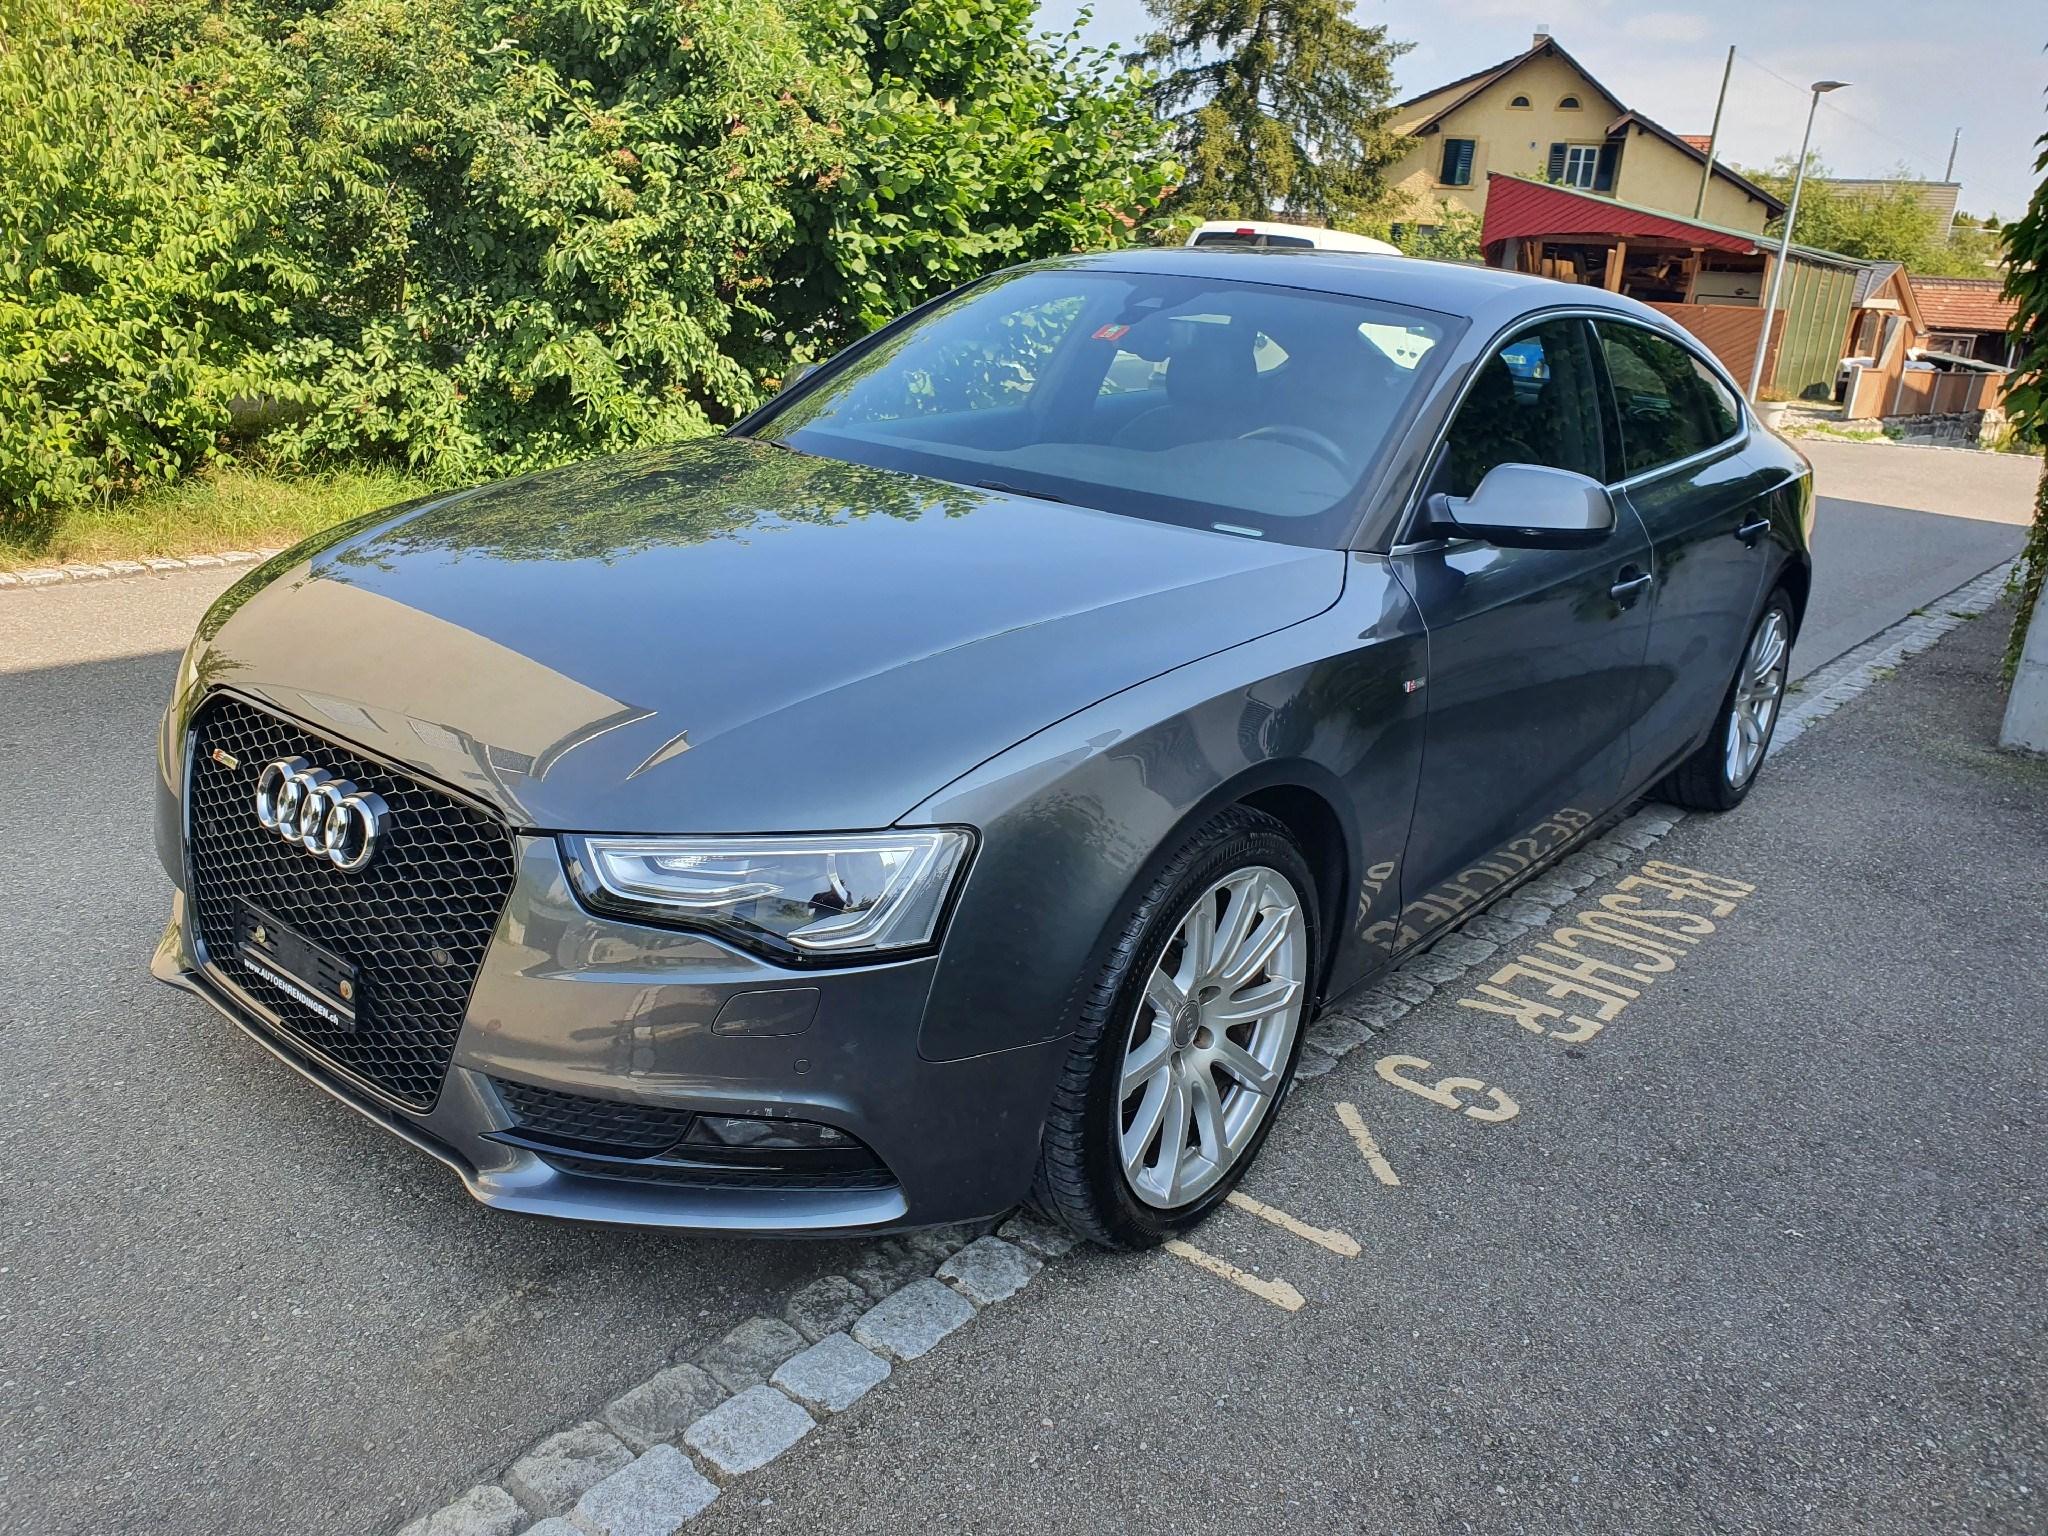 saloon Audi A5 Sportback 2.0 TDI multitronic